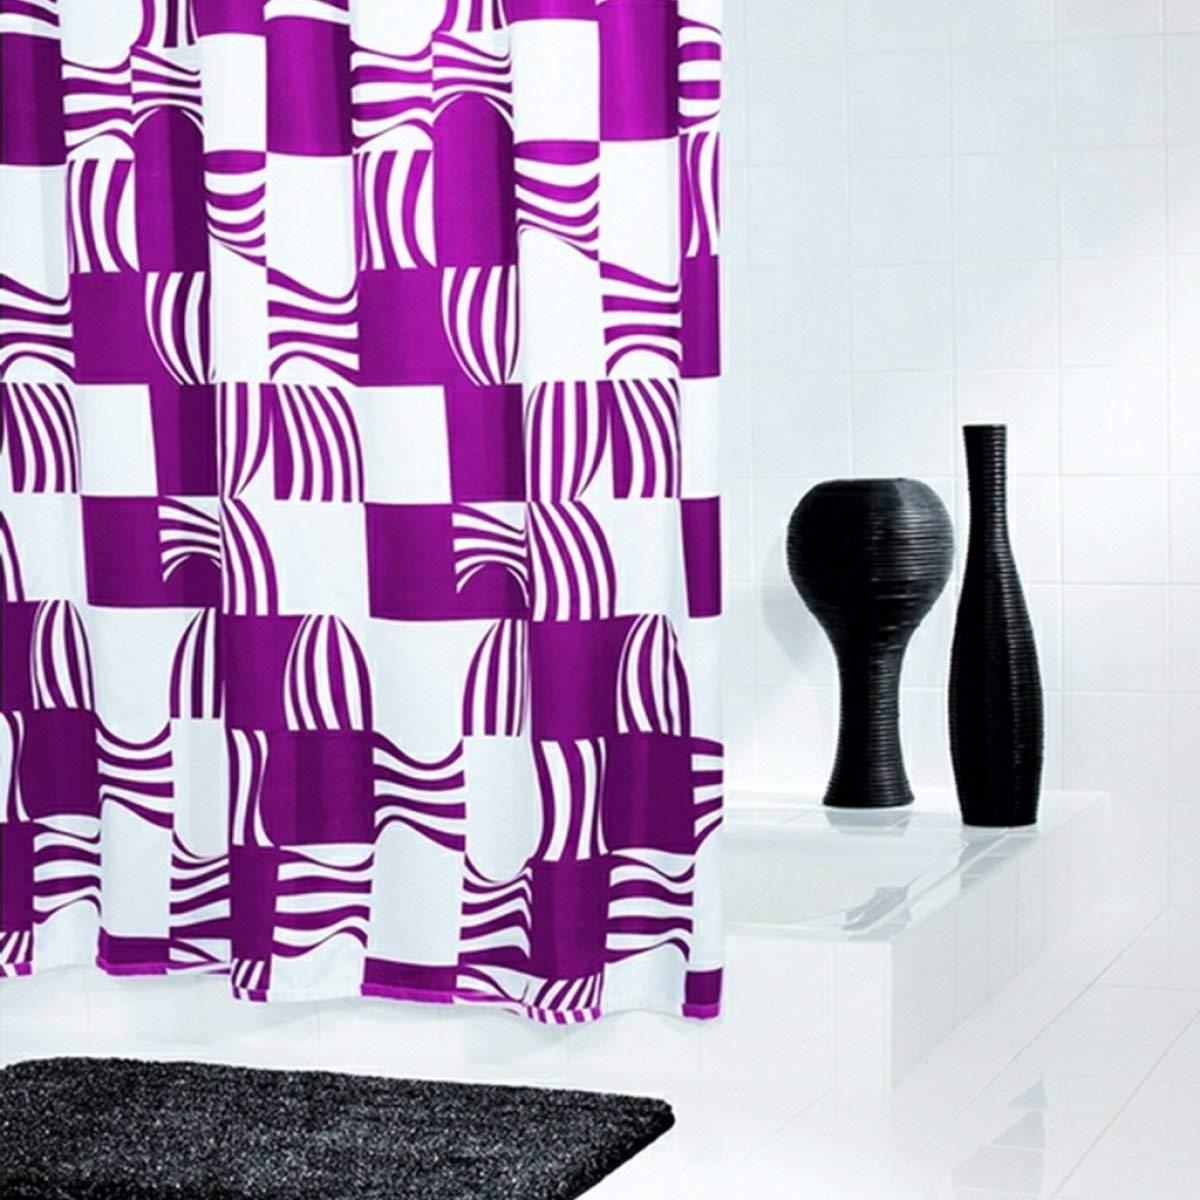 Zhuyuanhai 厚い不透明な防水カビポリエステルバスルームのシャワーカーテン増加浴室アクセサリー (Color : C) B07PYTDN6K C